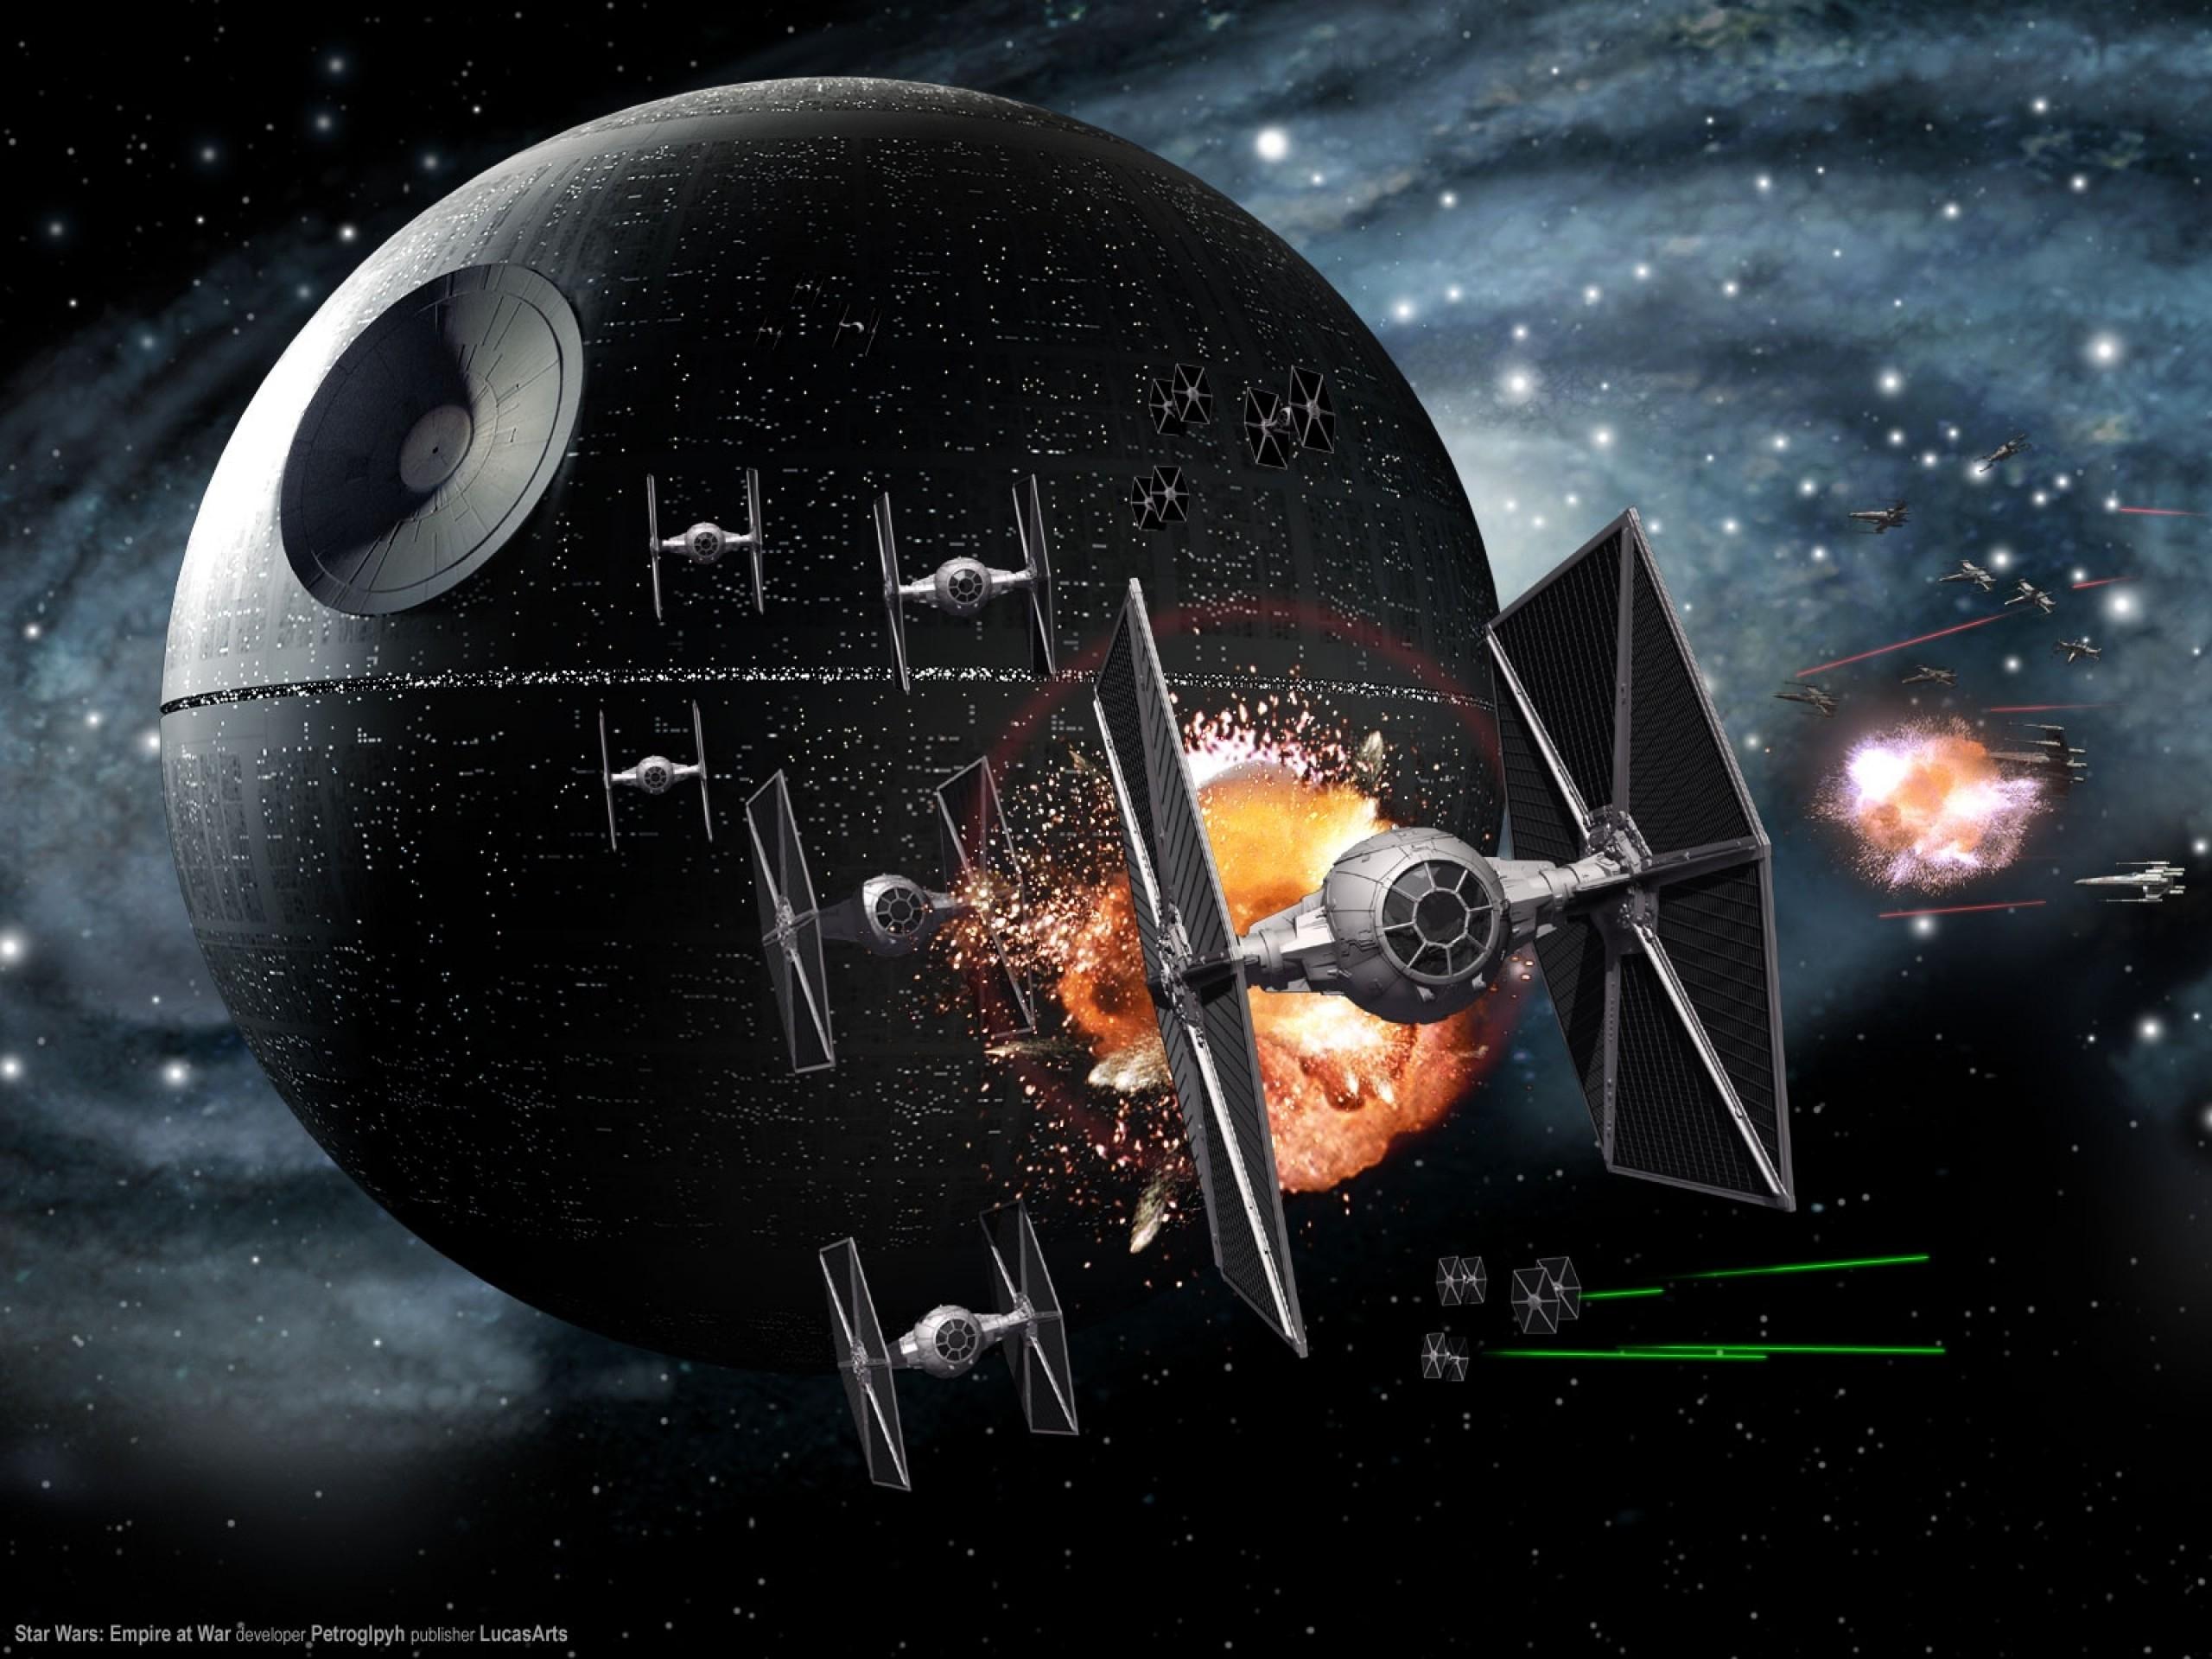 star-wars-death-star-tie-fighter-hd-wallpaper